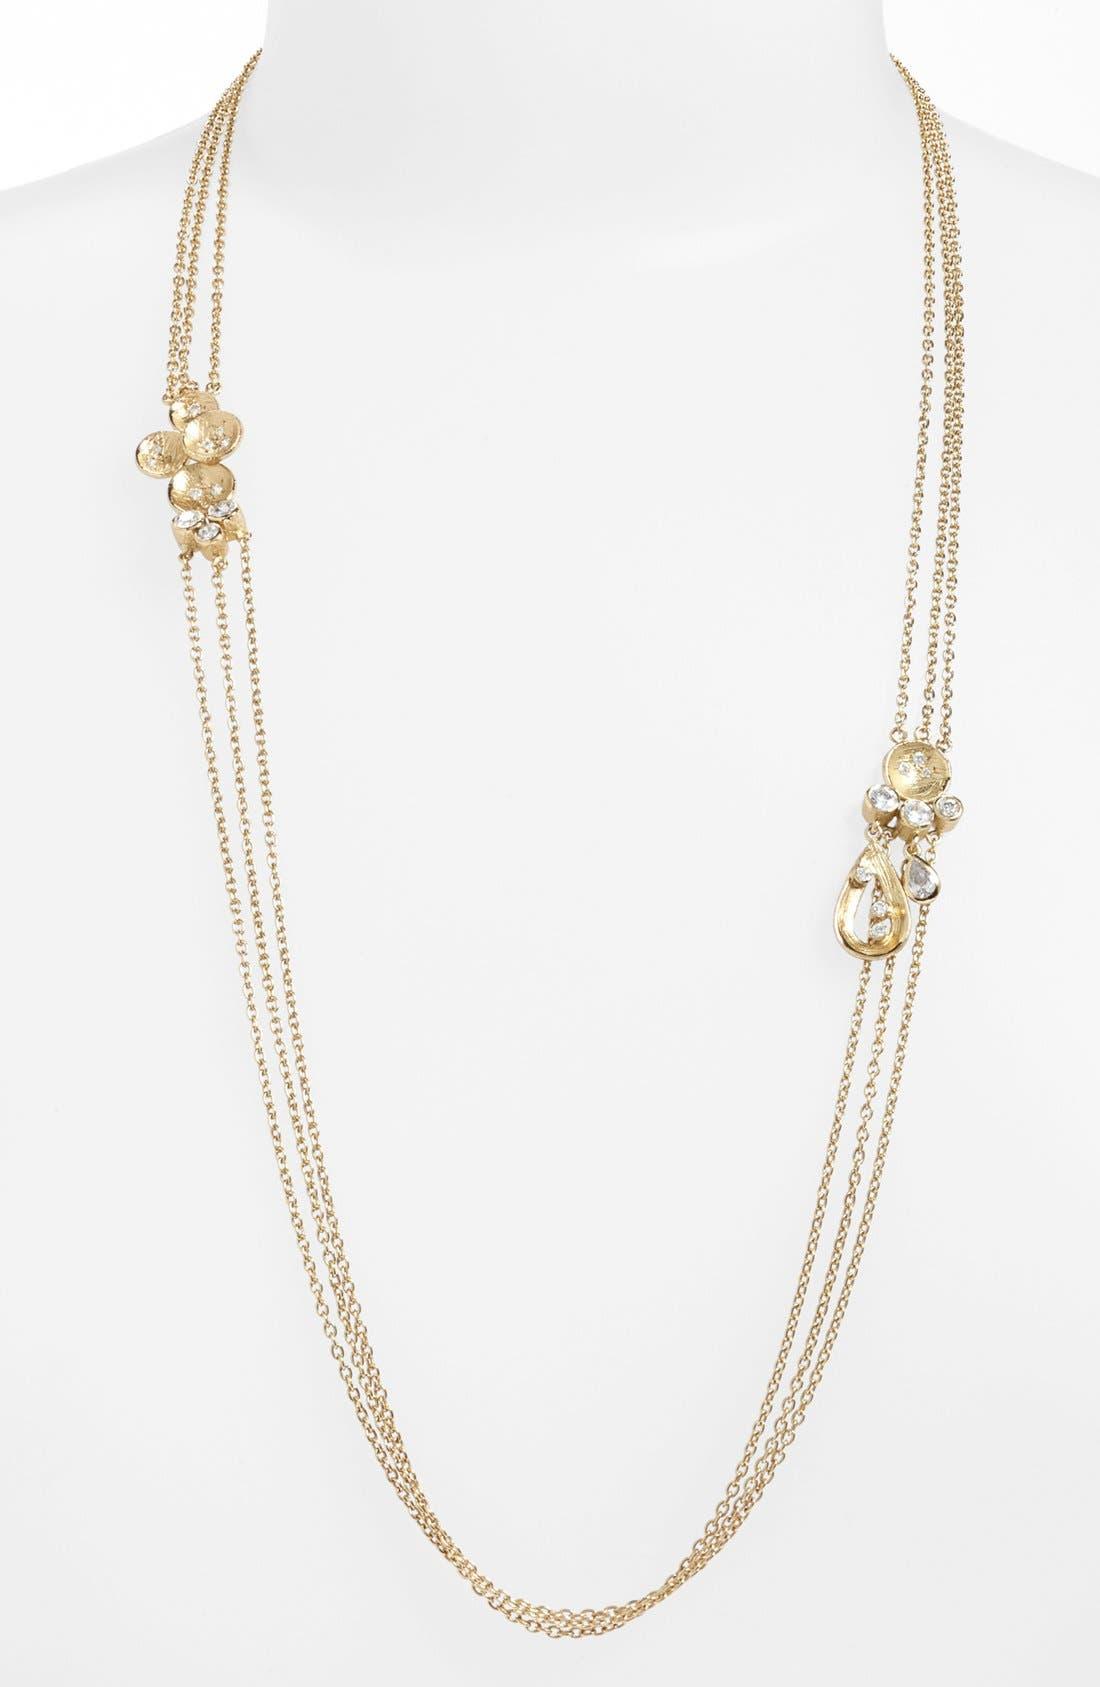 Main Image - Melinda Maria 'Hanna' Necklace